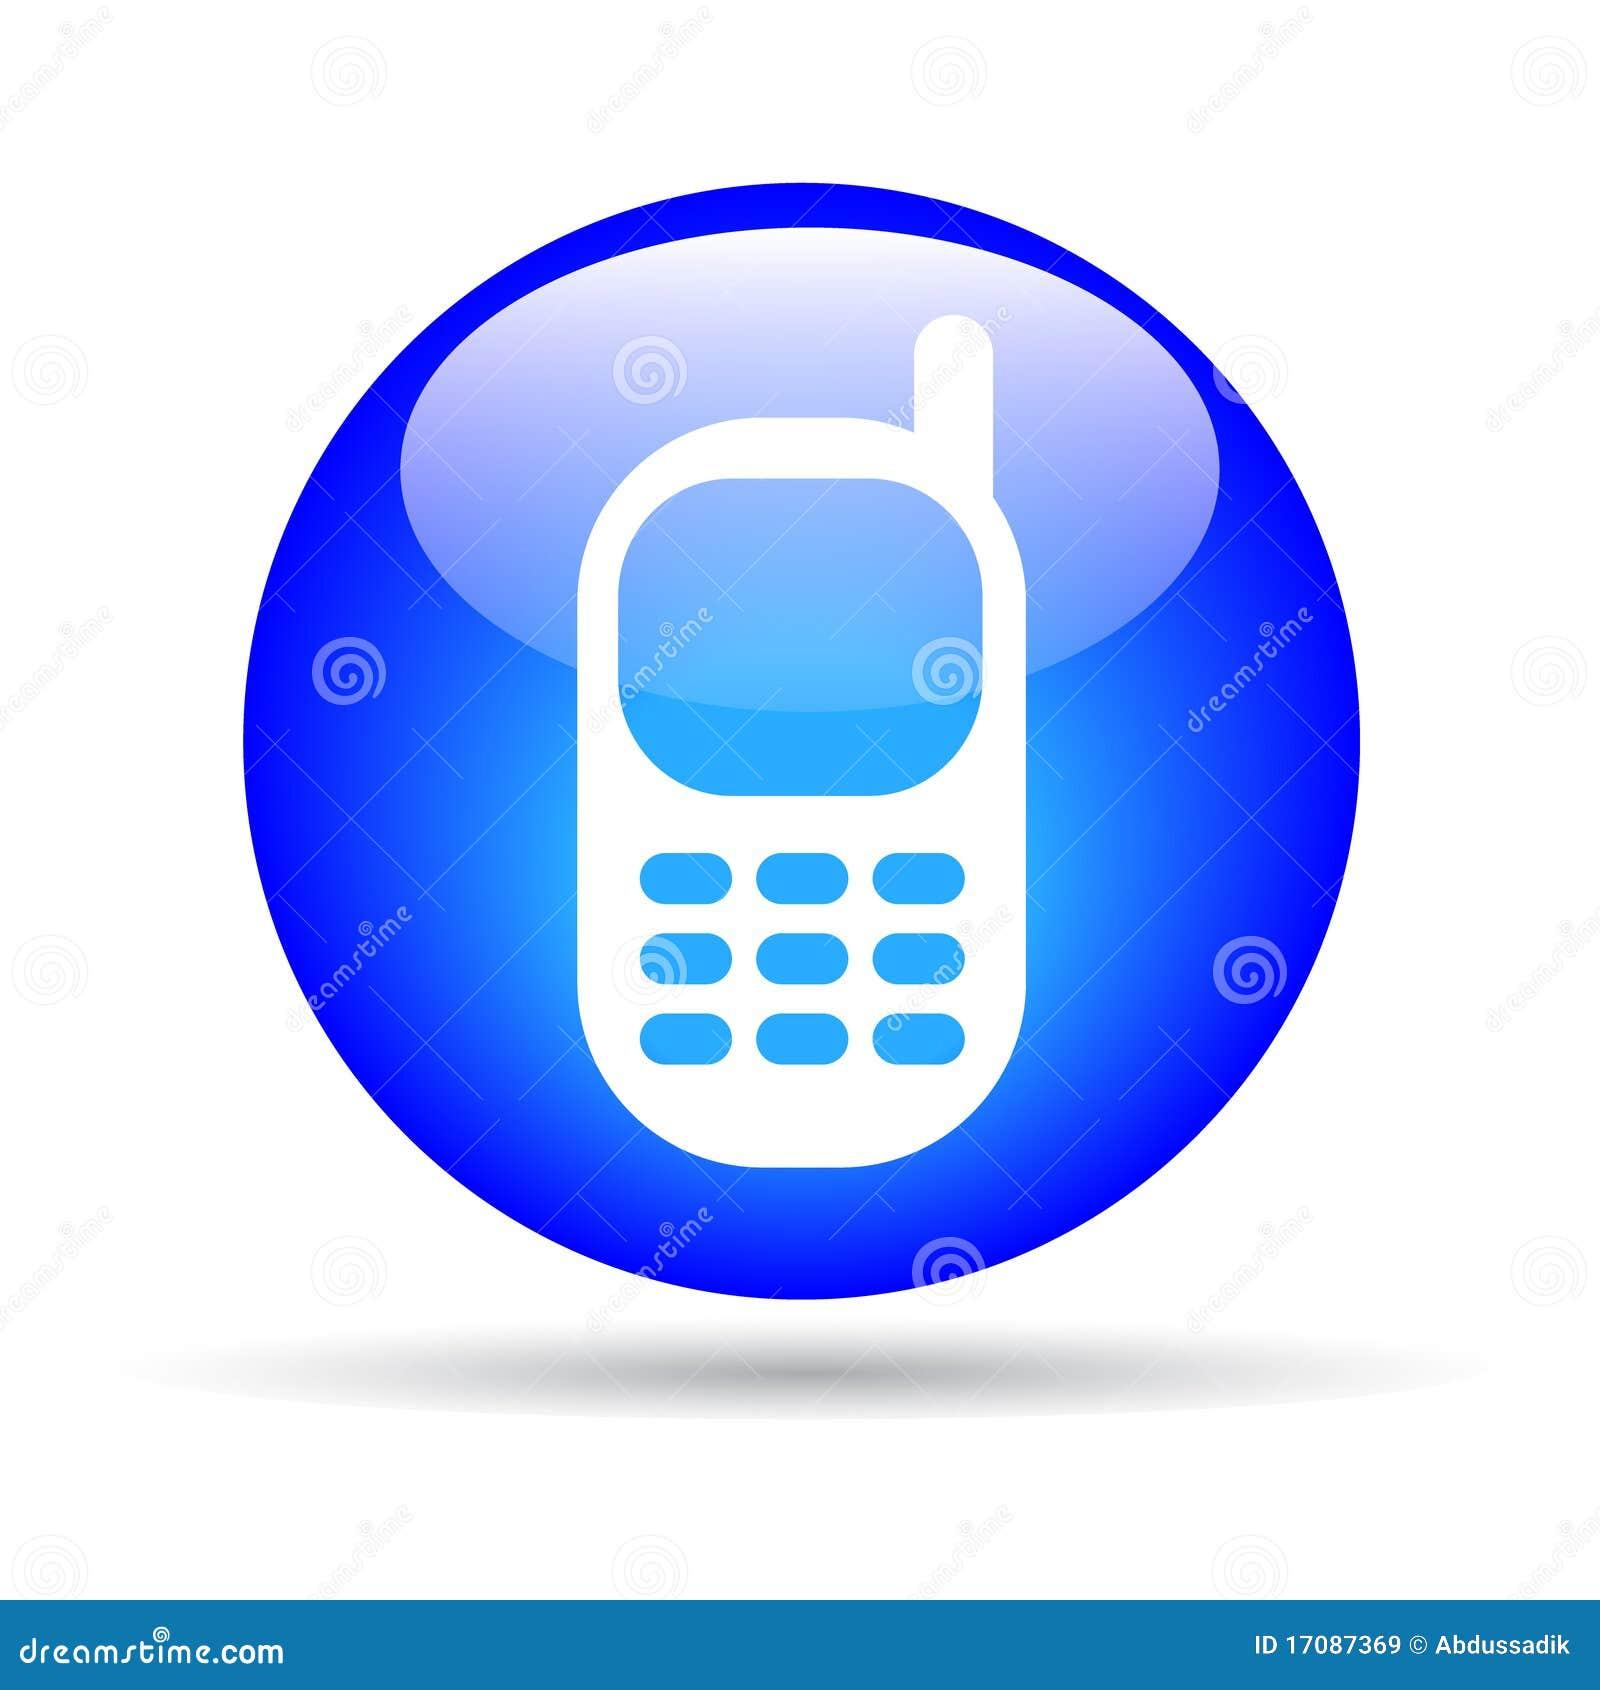 Mobile phone stock vector  Illustration of cellphone - 17087369